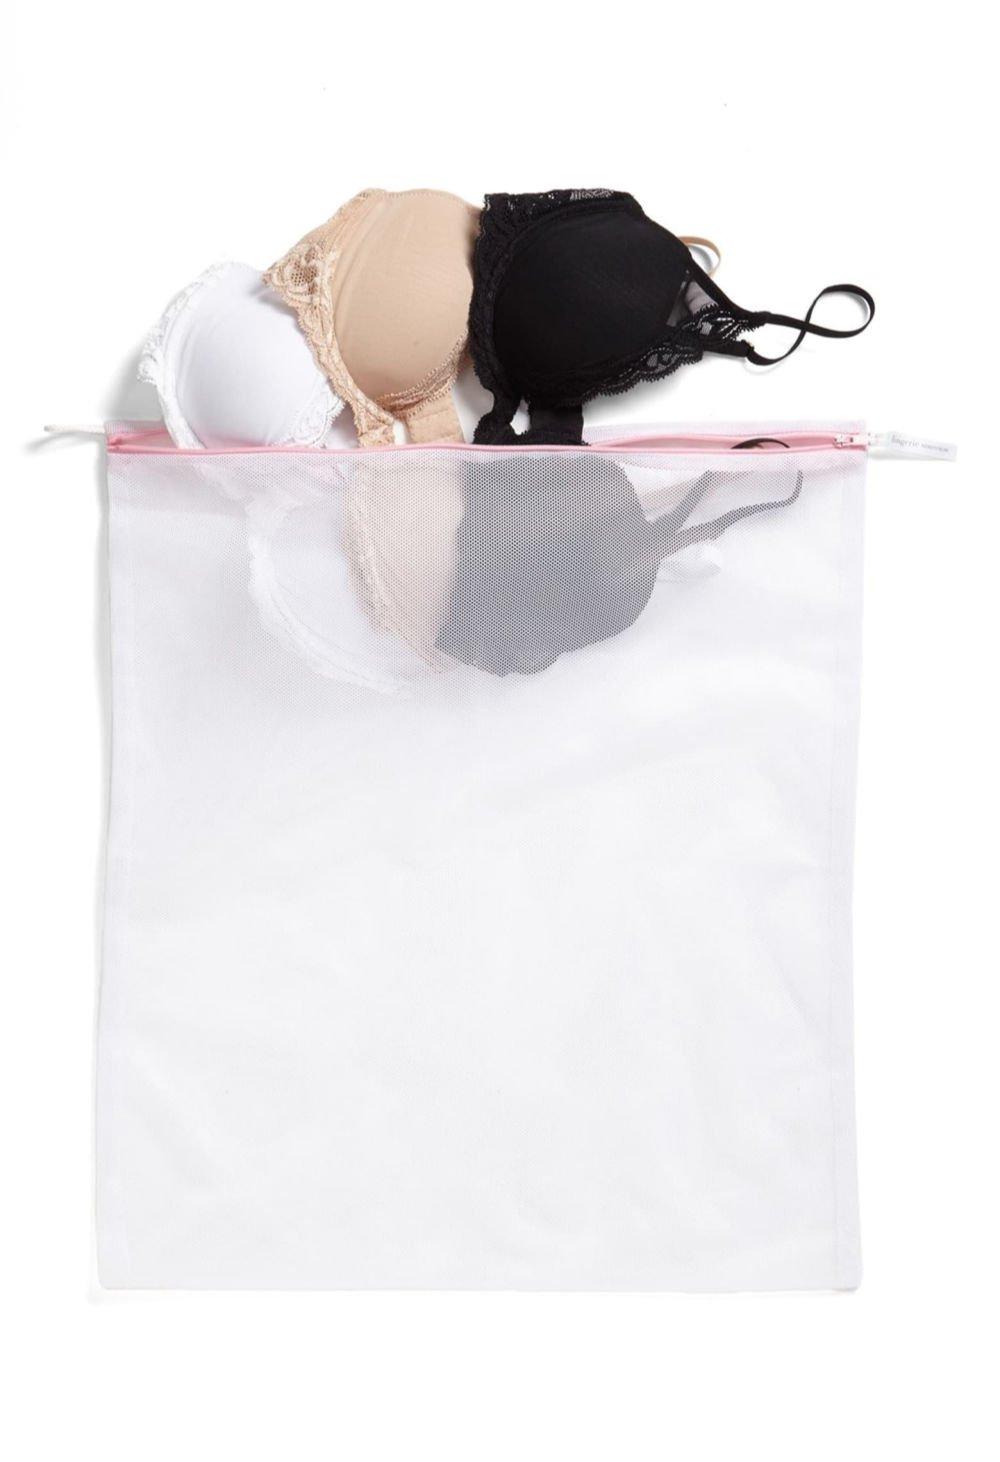 Lingerie bag for laundry. Details and more laundry tips at une femme d'un certain age.